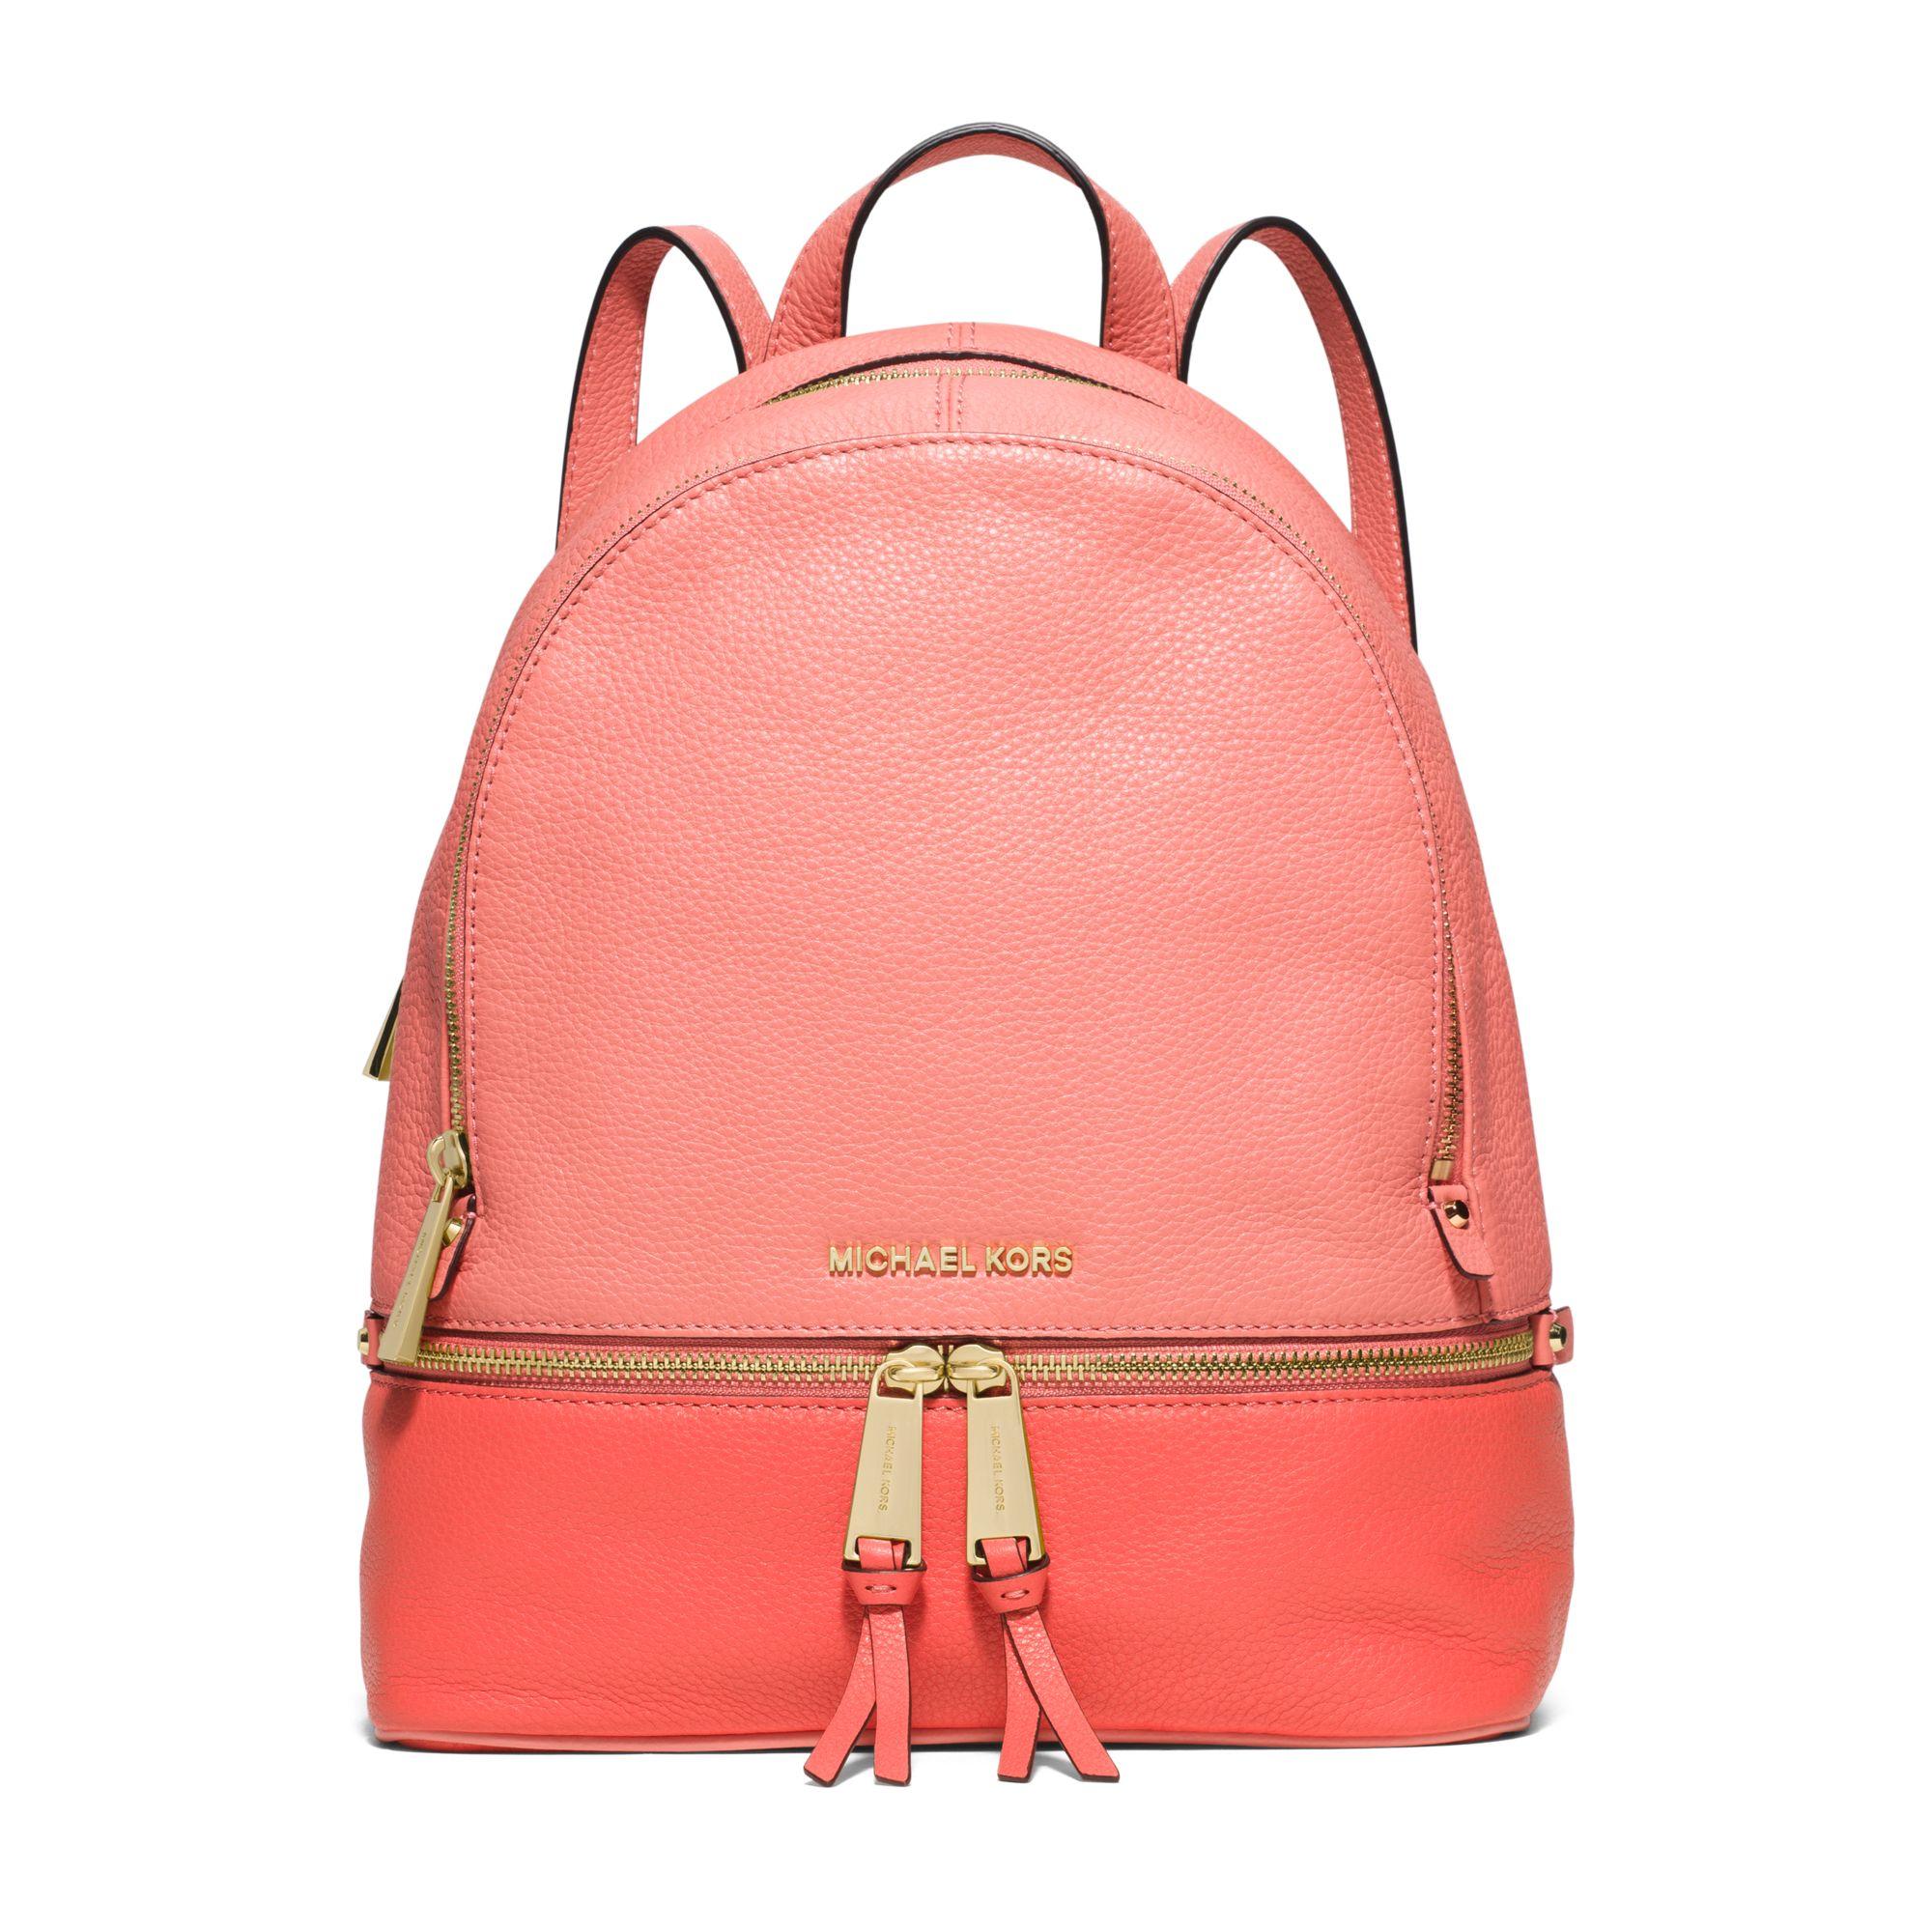 238392dfdeb8 Michael Kors Rhea Medium Color-block Leather Backpack in Pink - Lyst